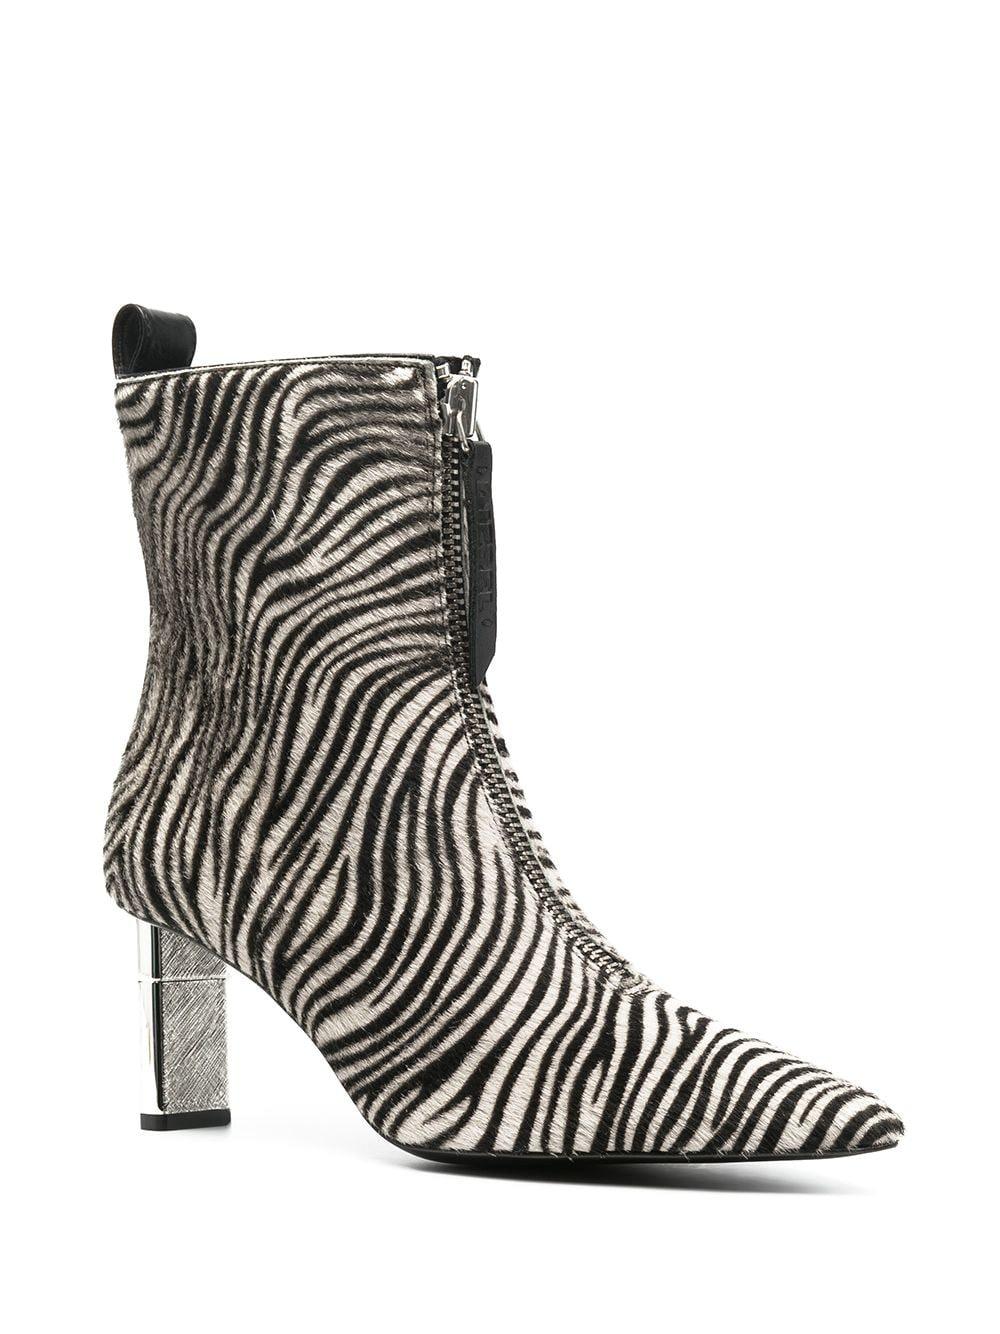 Disel Zebra Print 100mm Pony Hair Boots